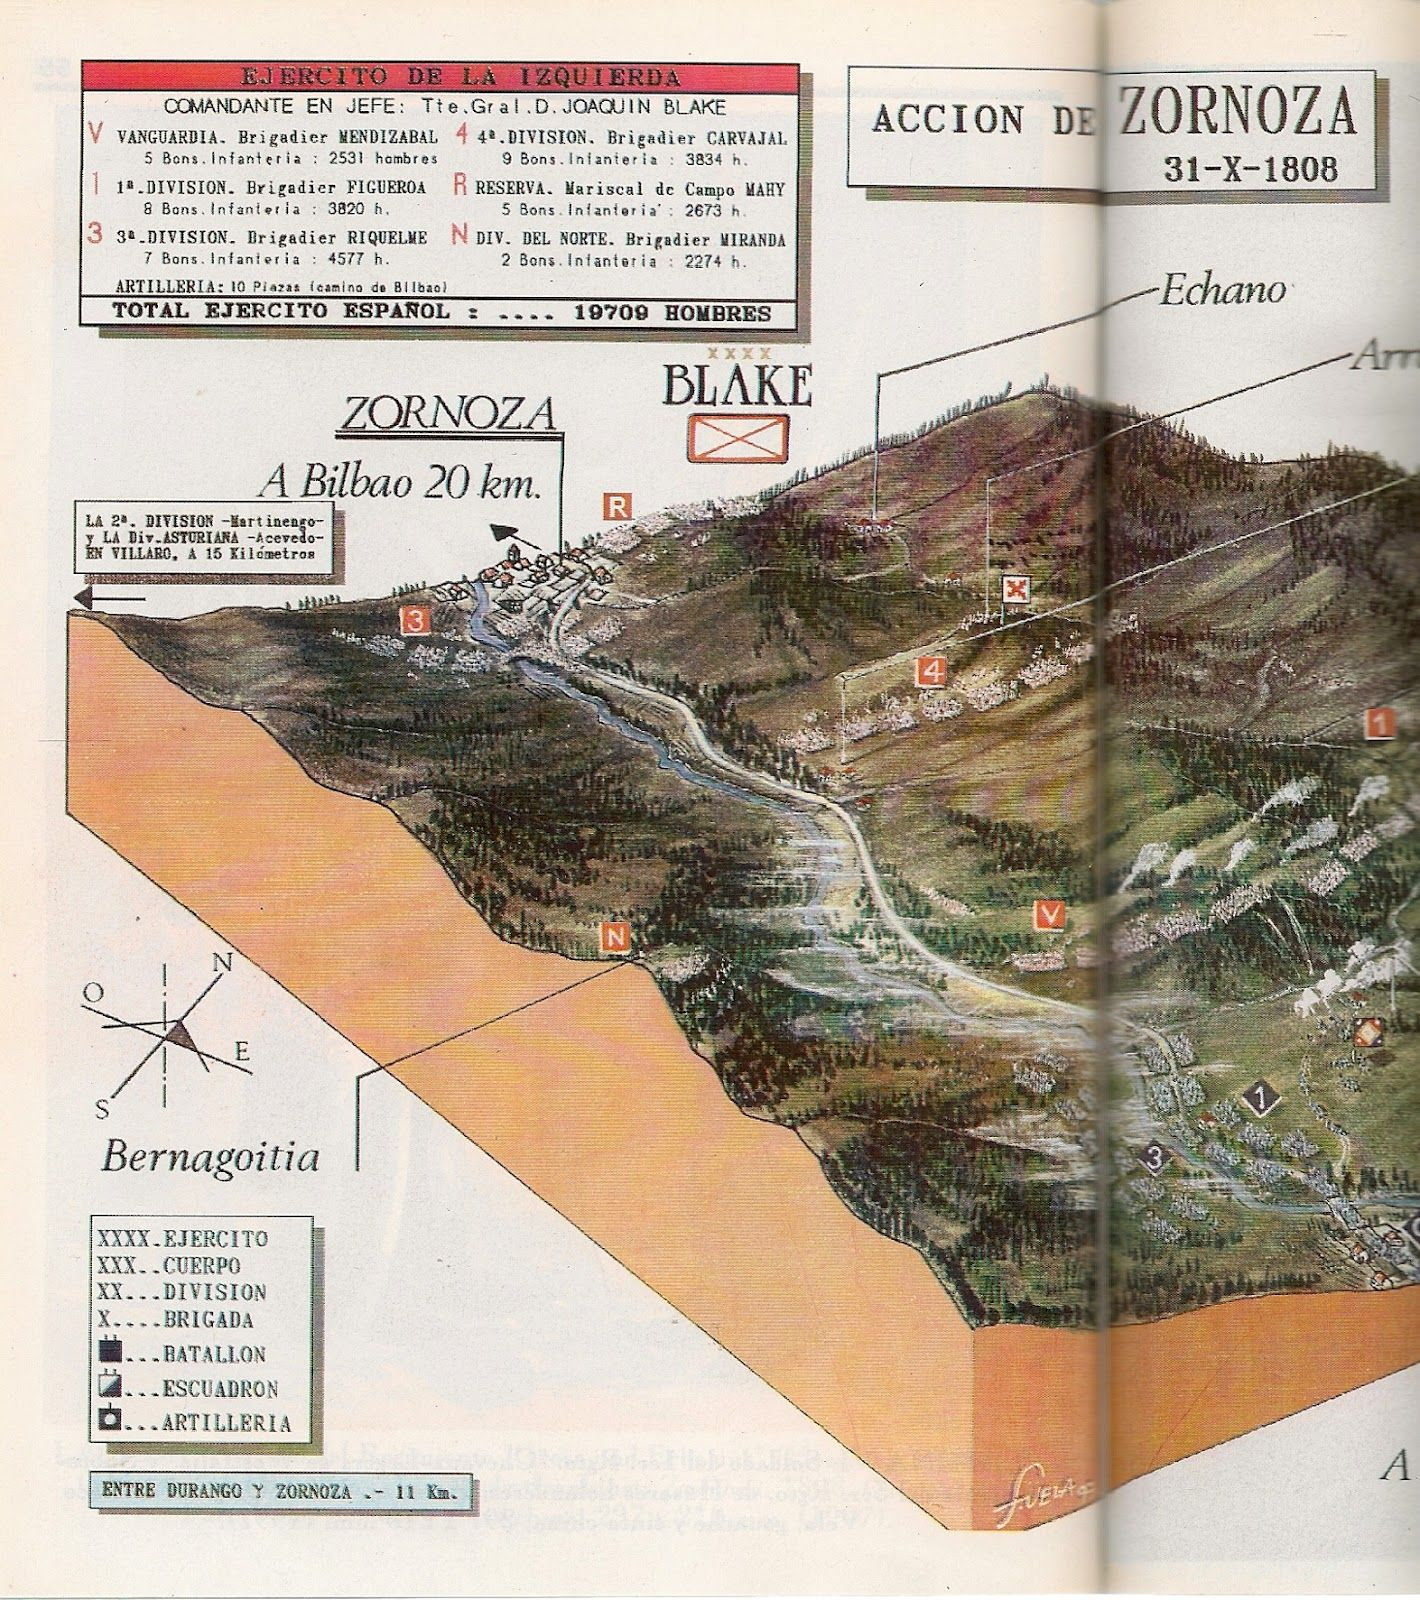 Battle of Zornoza Map 31 October 1808